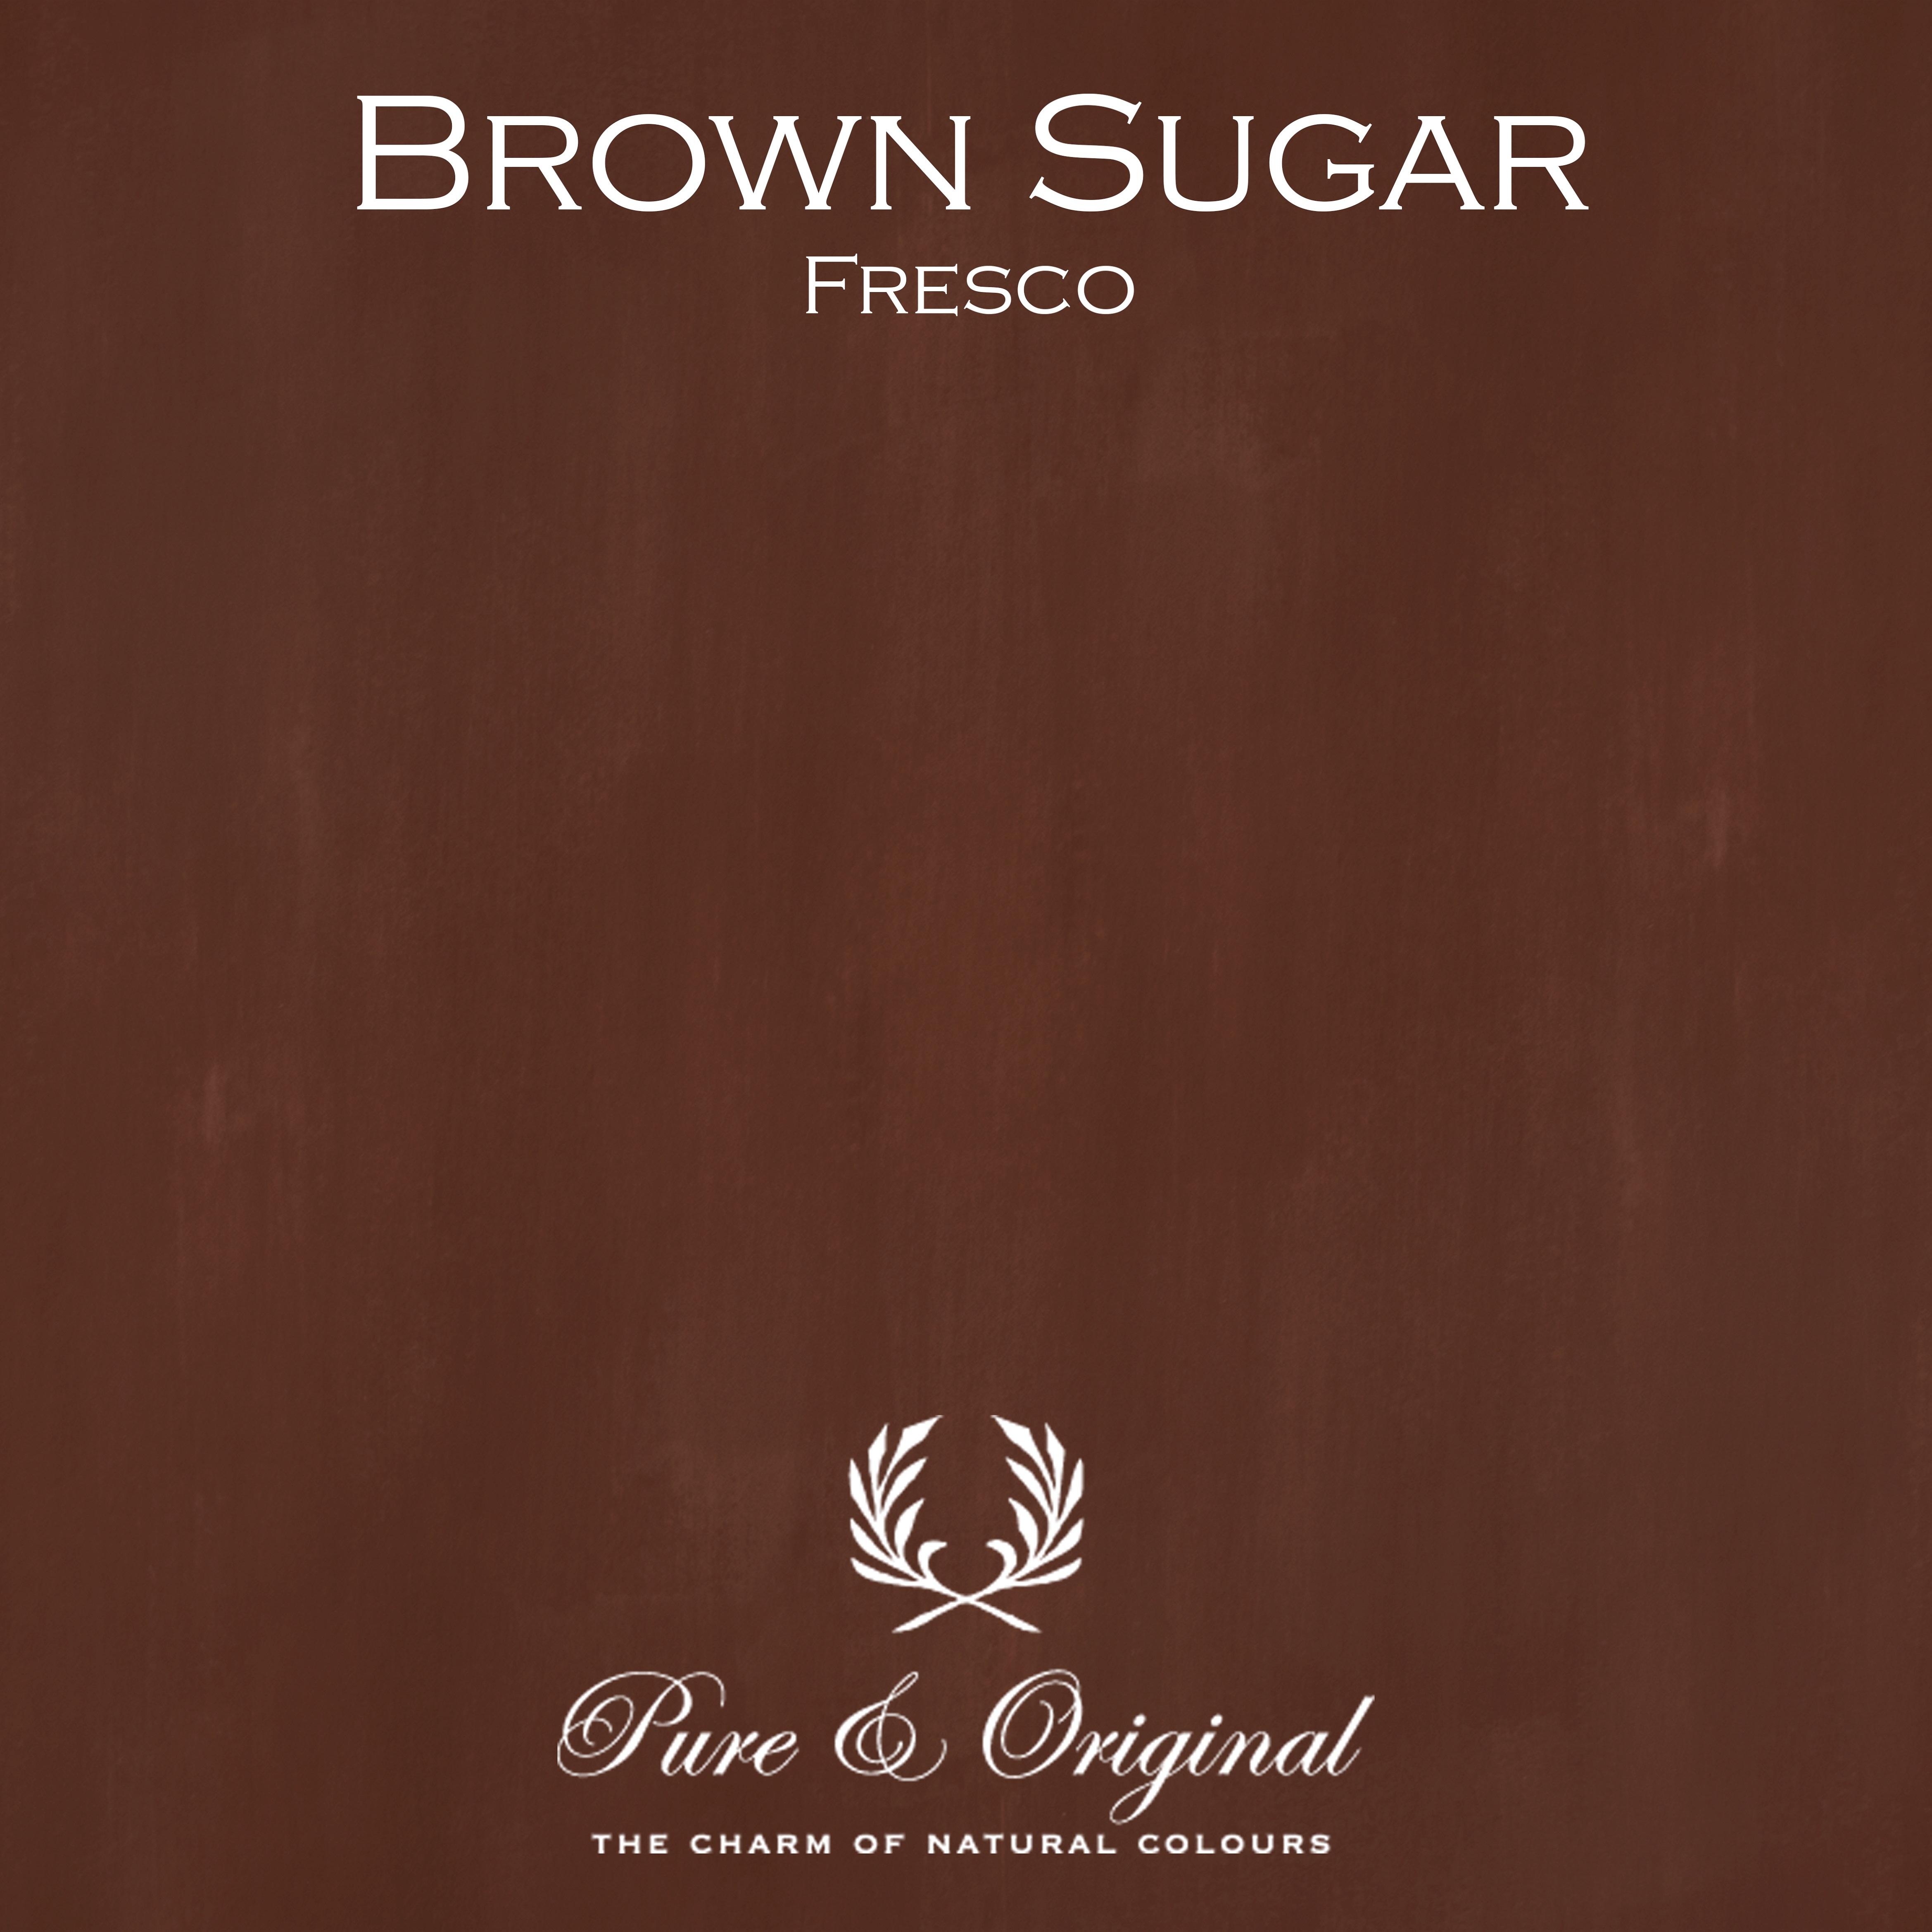 Kulör Brown Sugar, Fresco kalkfärg